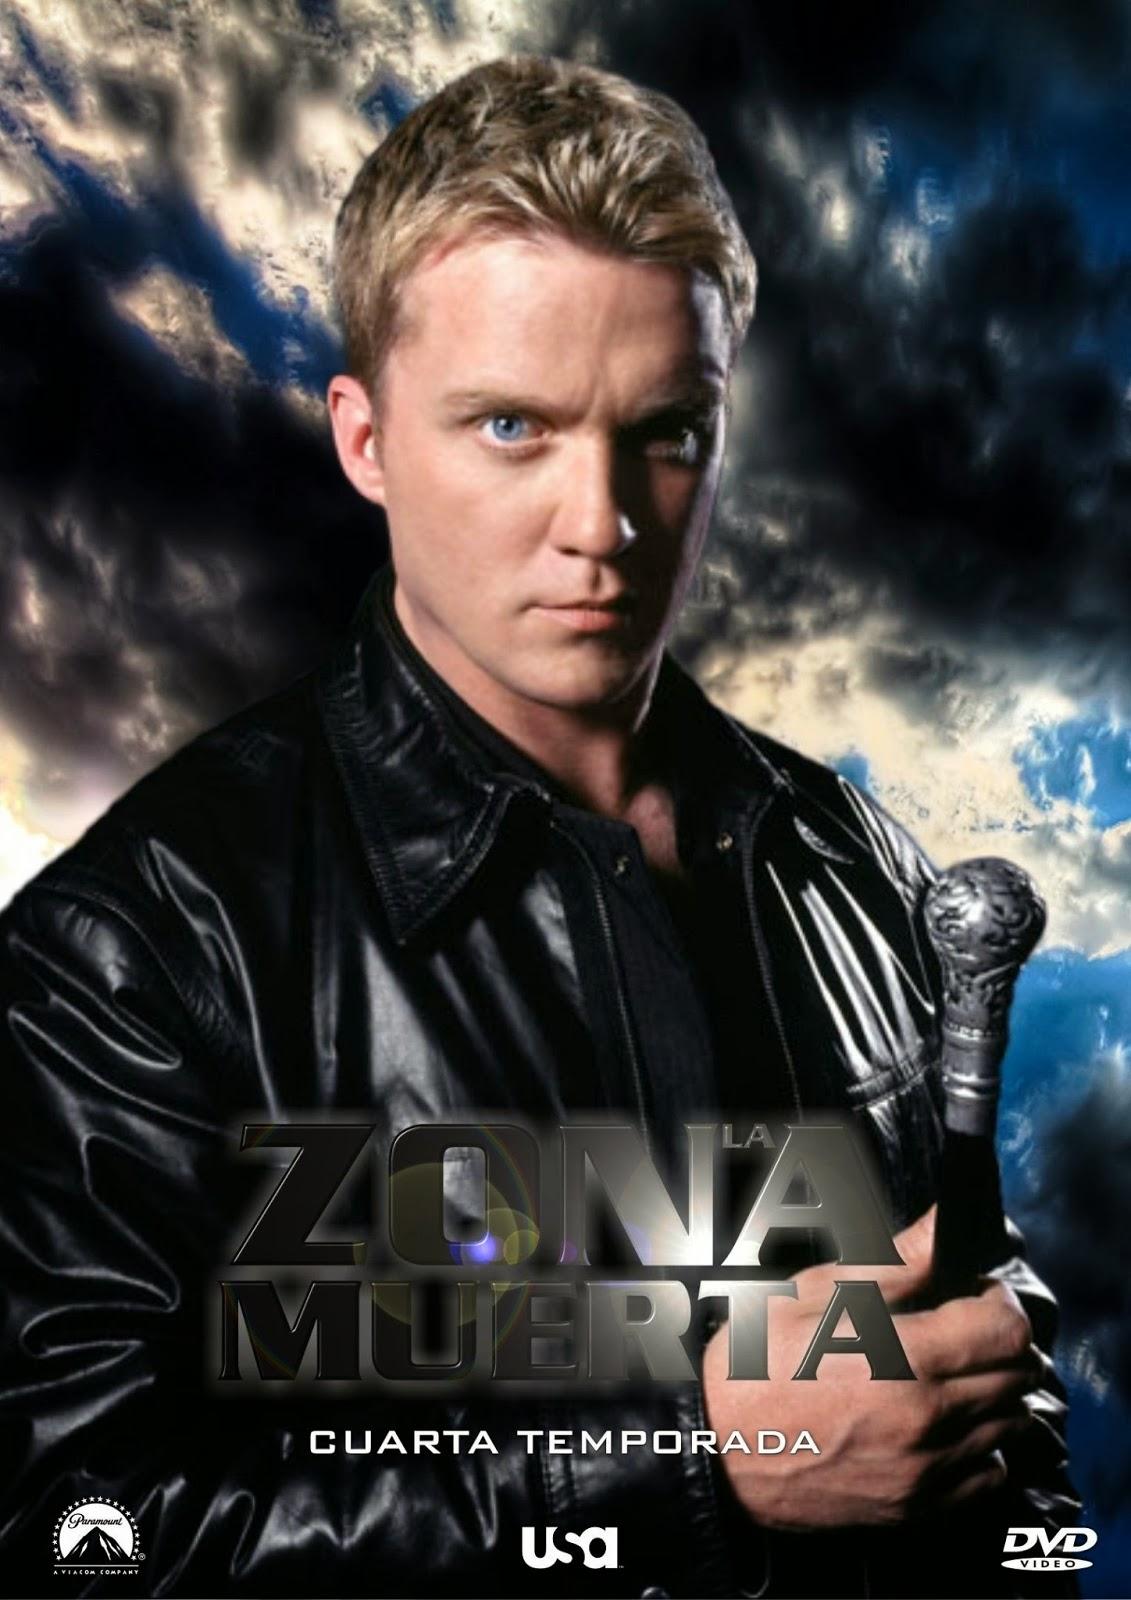 La Zona Muerta - Temporada 4 - Audio Latino - (2005)